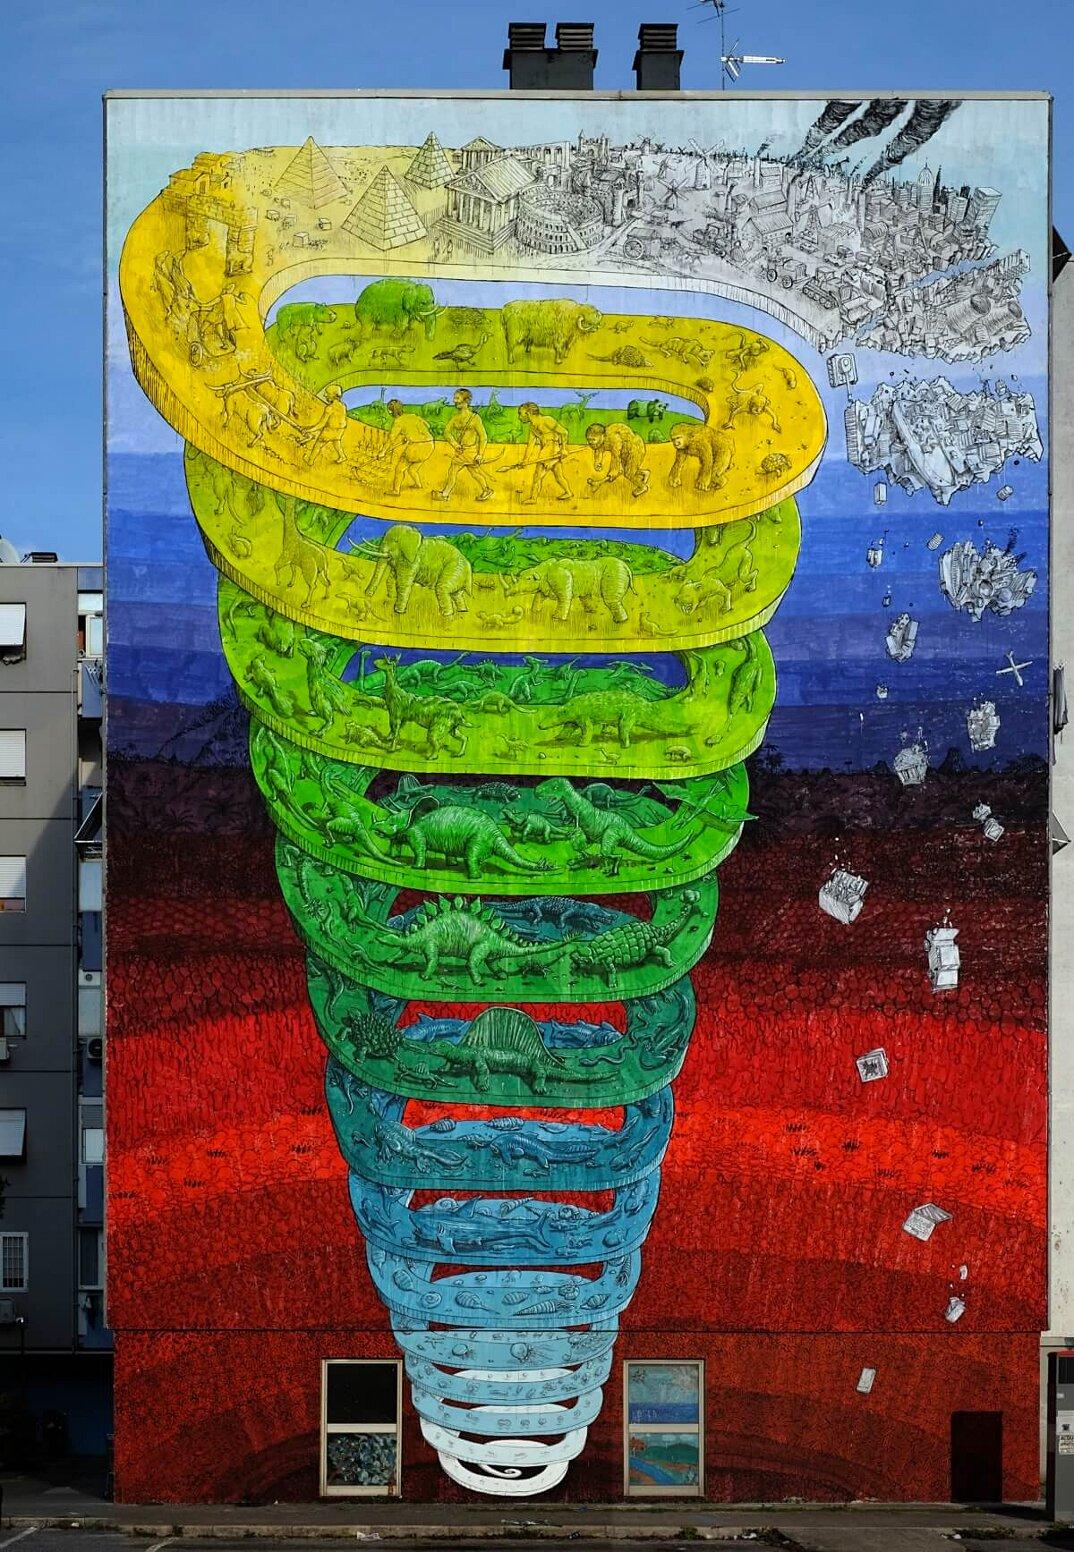 murale-blu-roma-tor-de-pazzi-blu-street-art-2